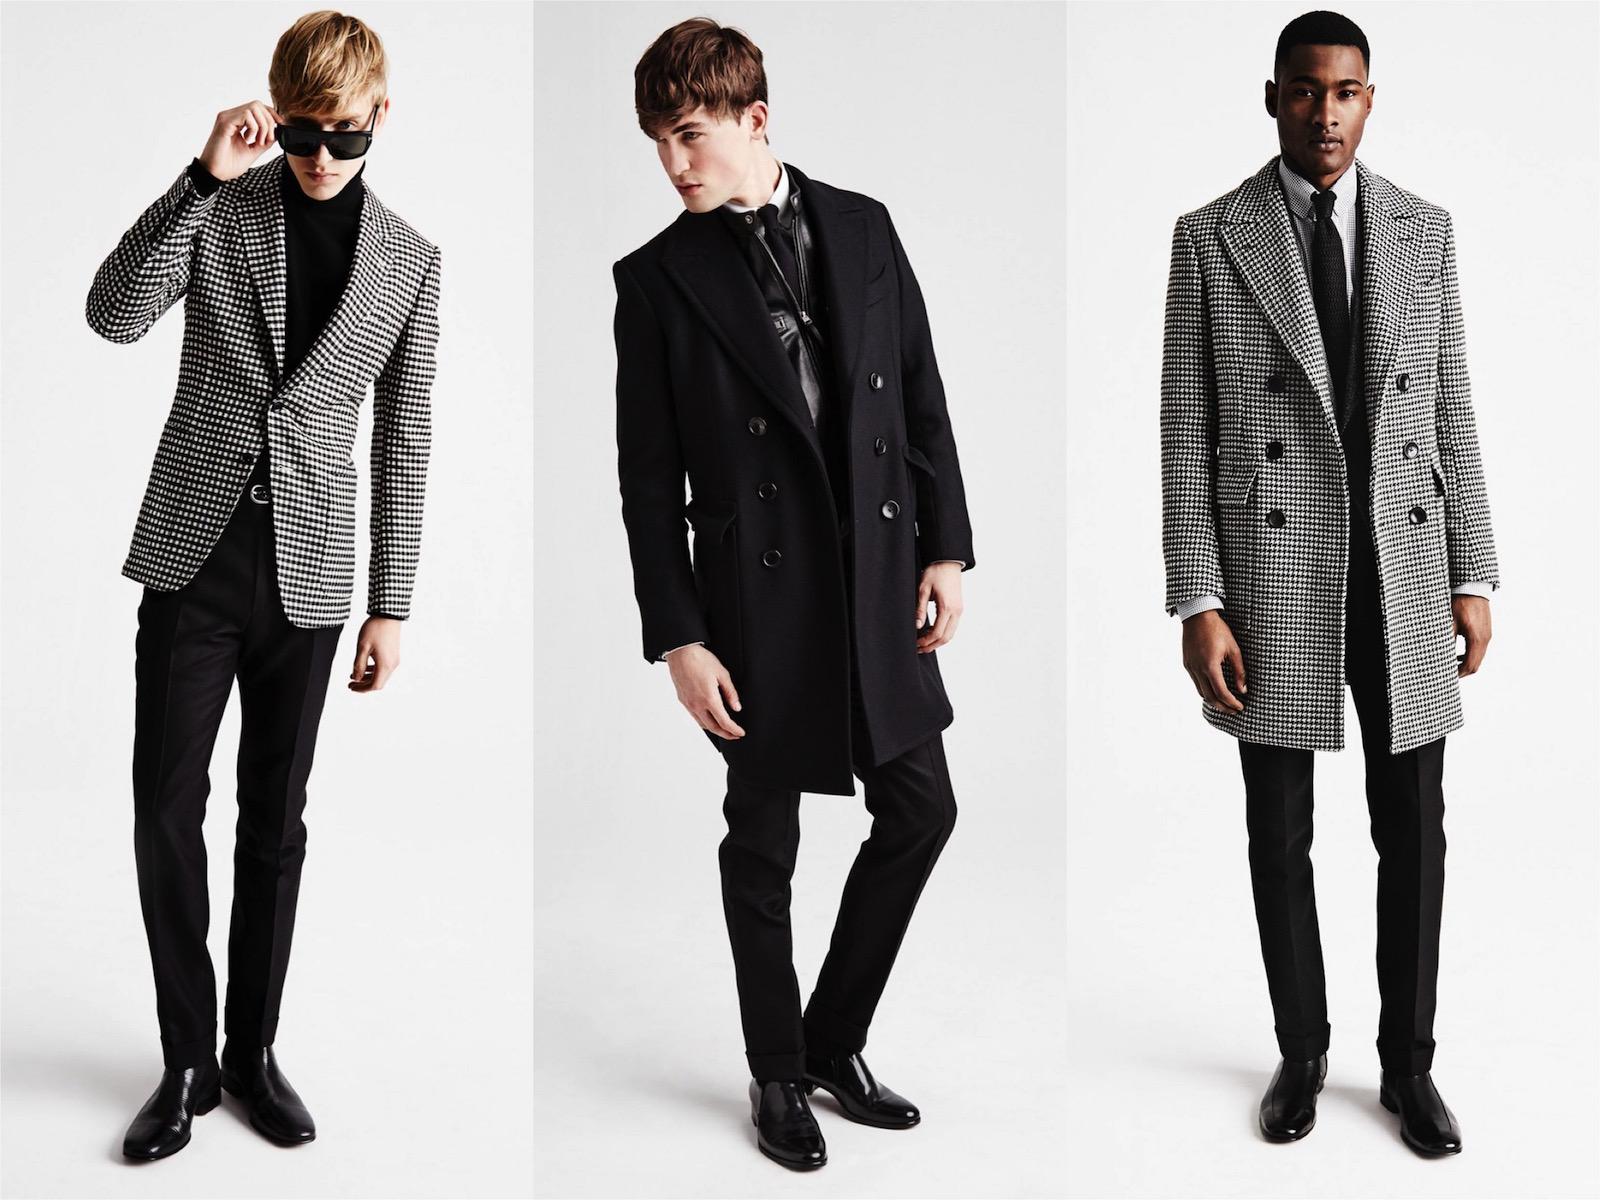 Tom Ford Menswear Fall Winter 2015